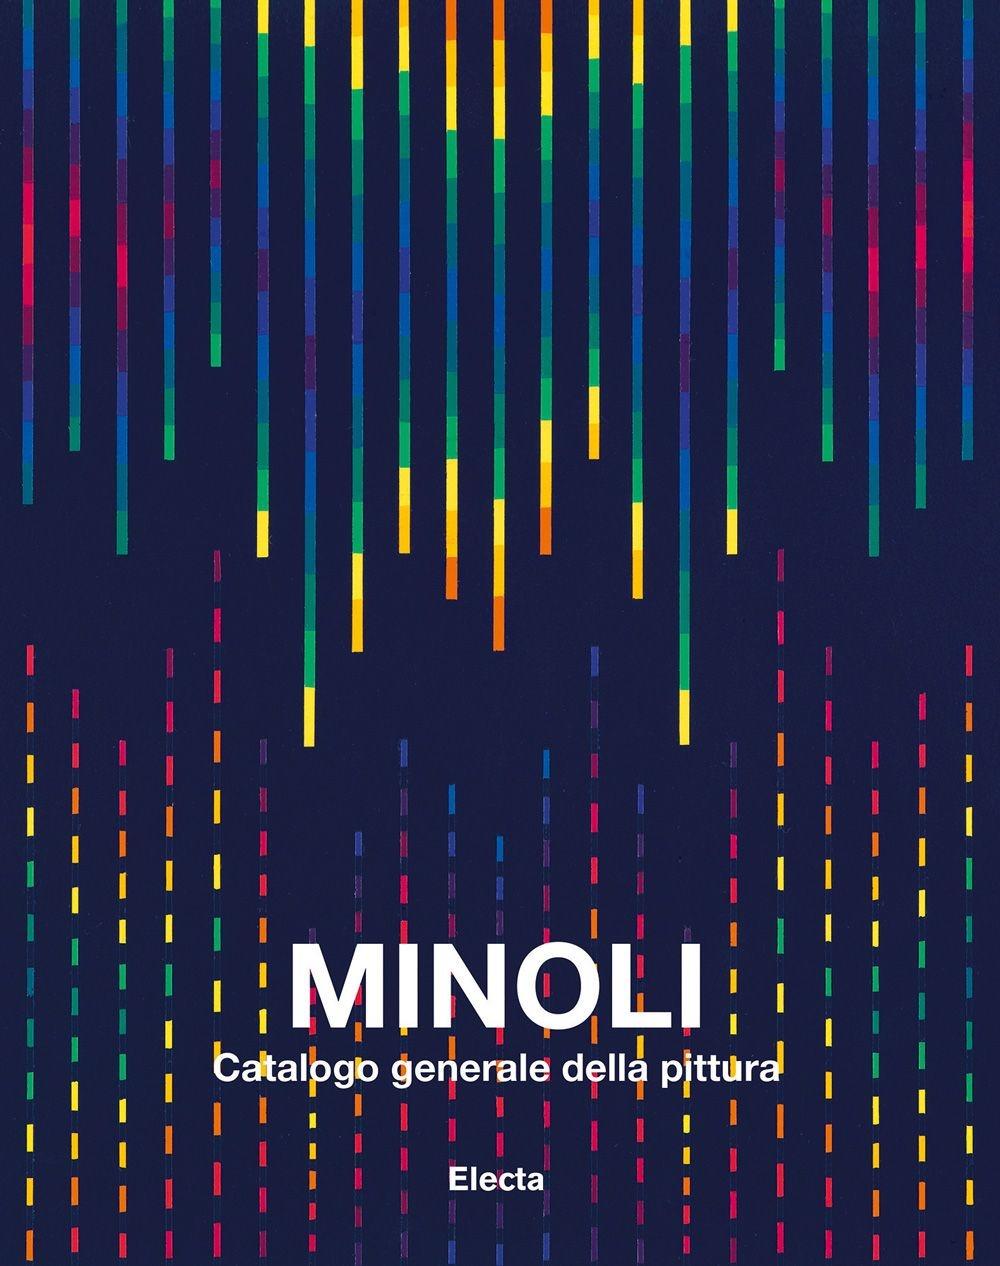 Minoli. Catalogo generale della pittura. Ediz. illustrata. Vol. 3: 1993-2004